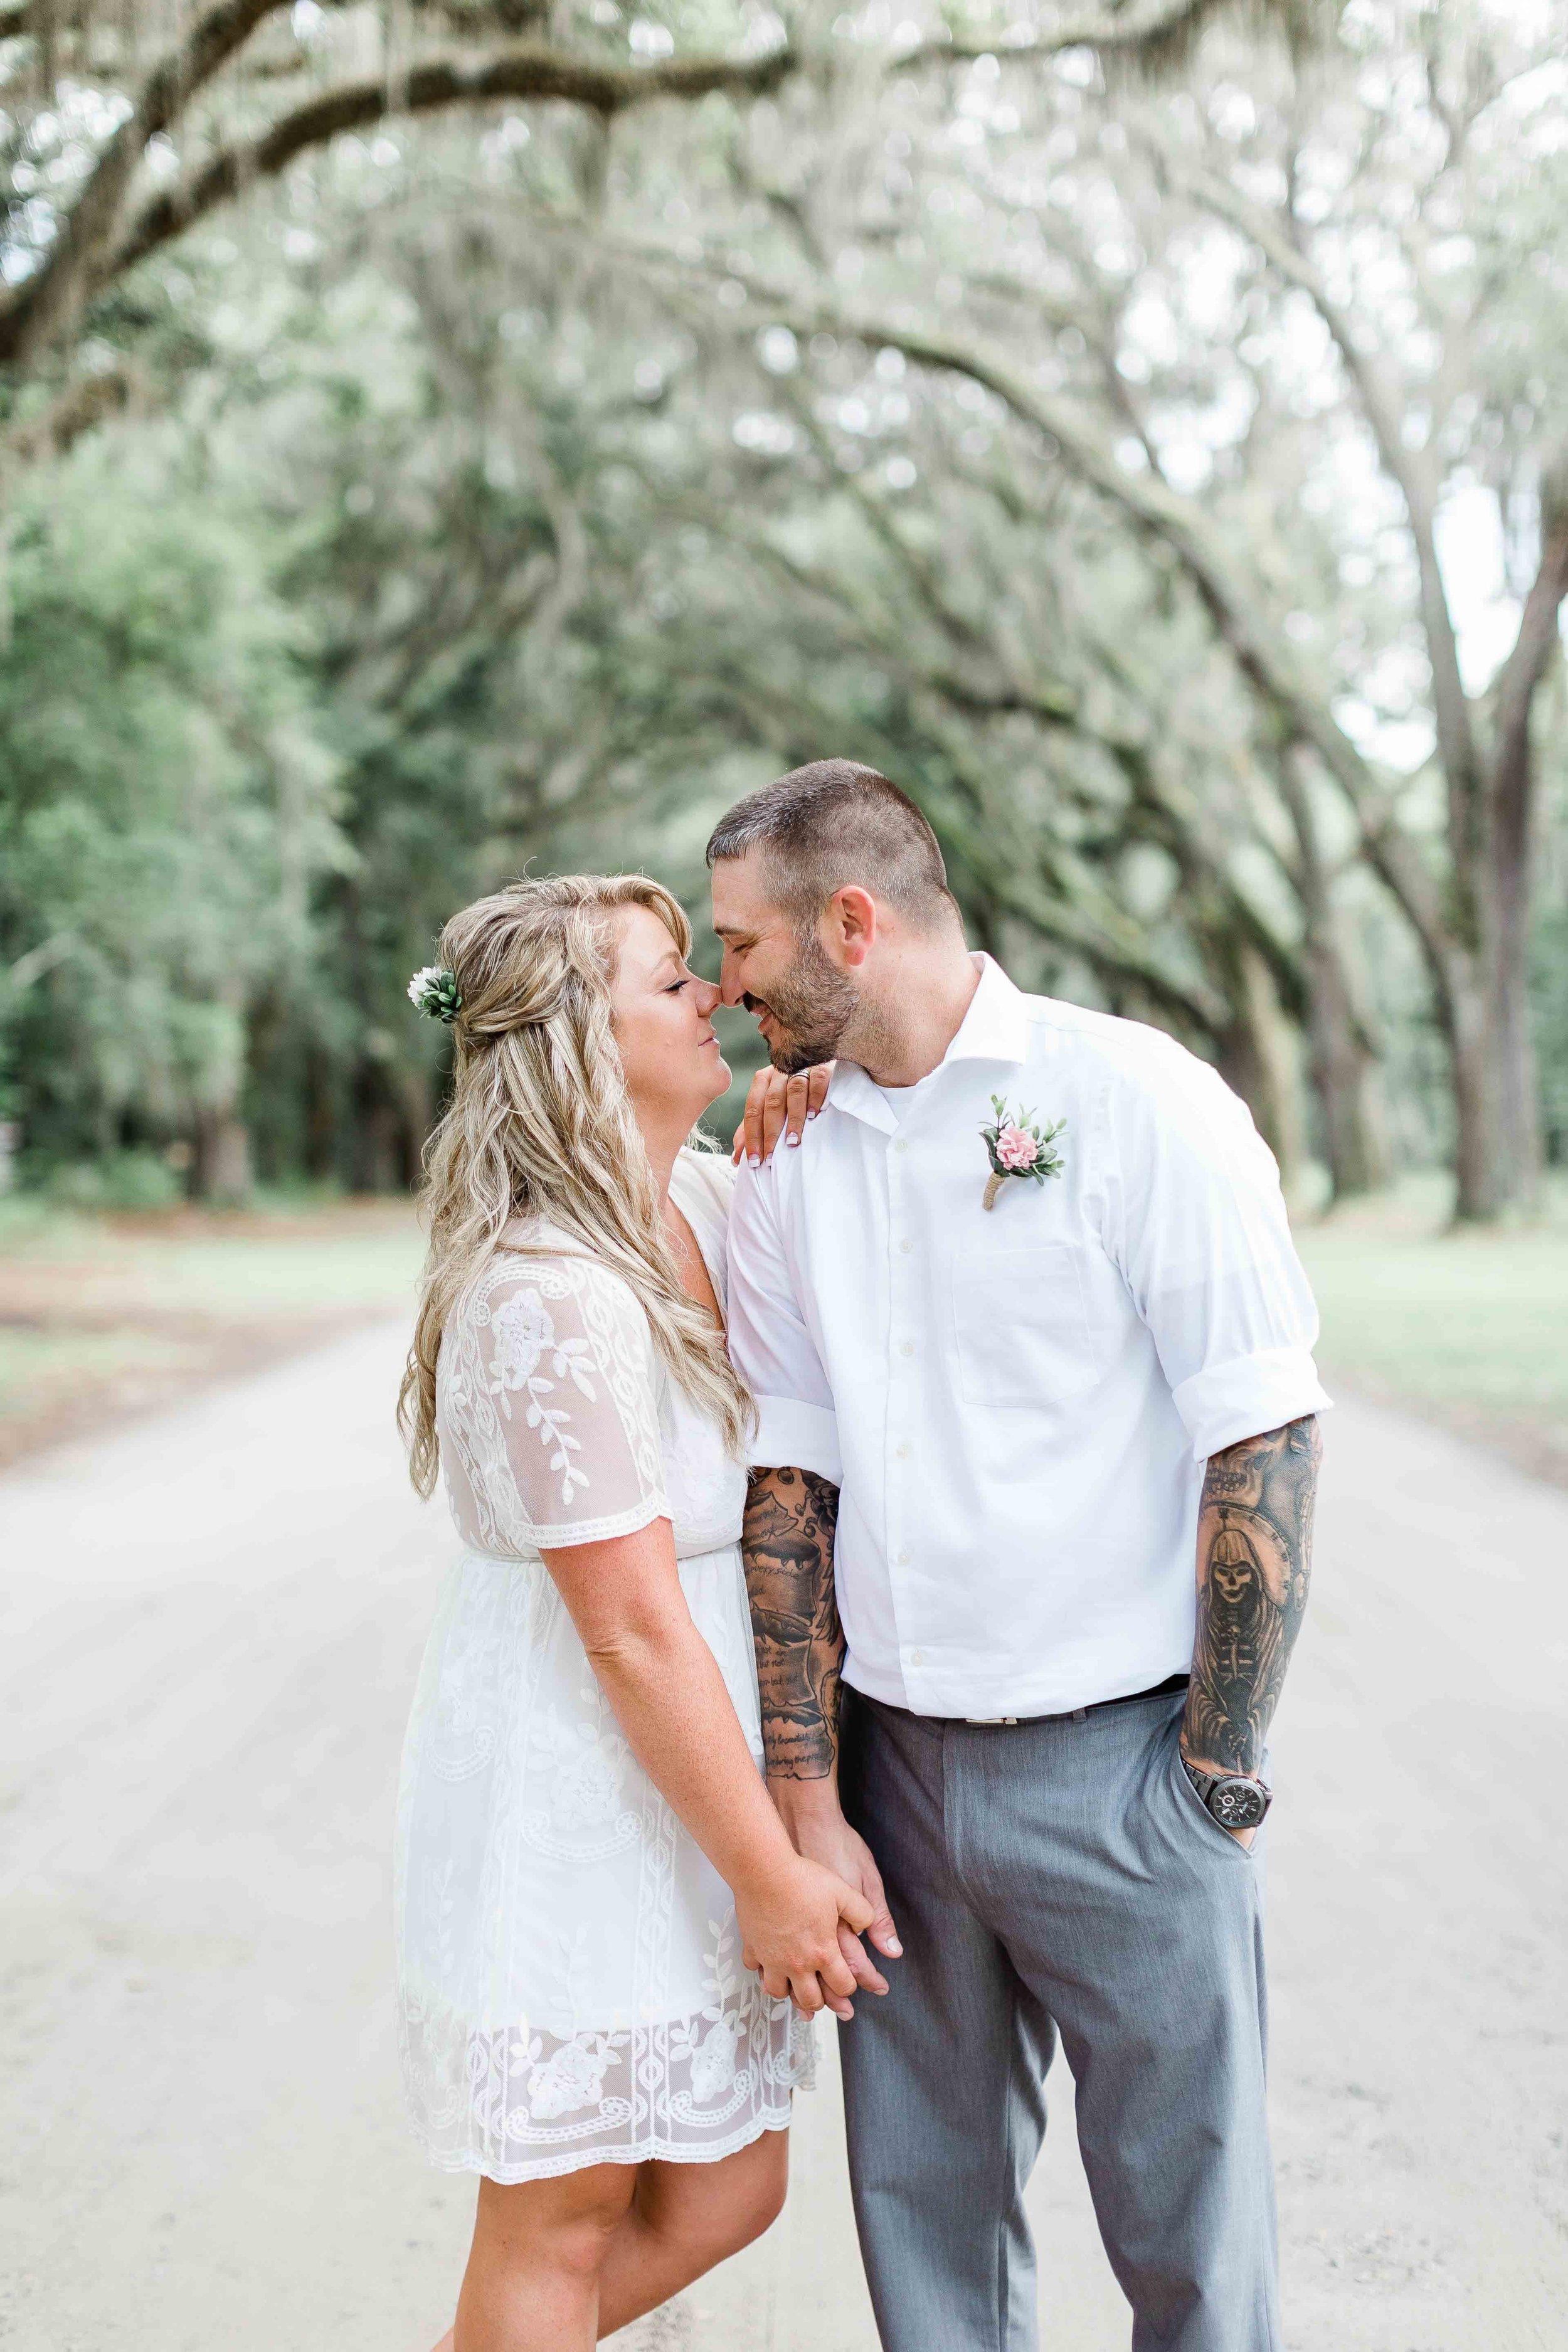 20190727Georgia-Wormlsoe Plantation-Simply Eloped-Savannah Wedding Photographer- Southern Lens Photography42.jpg